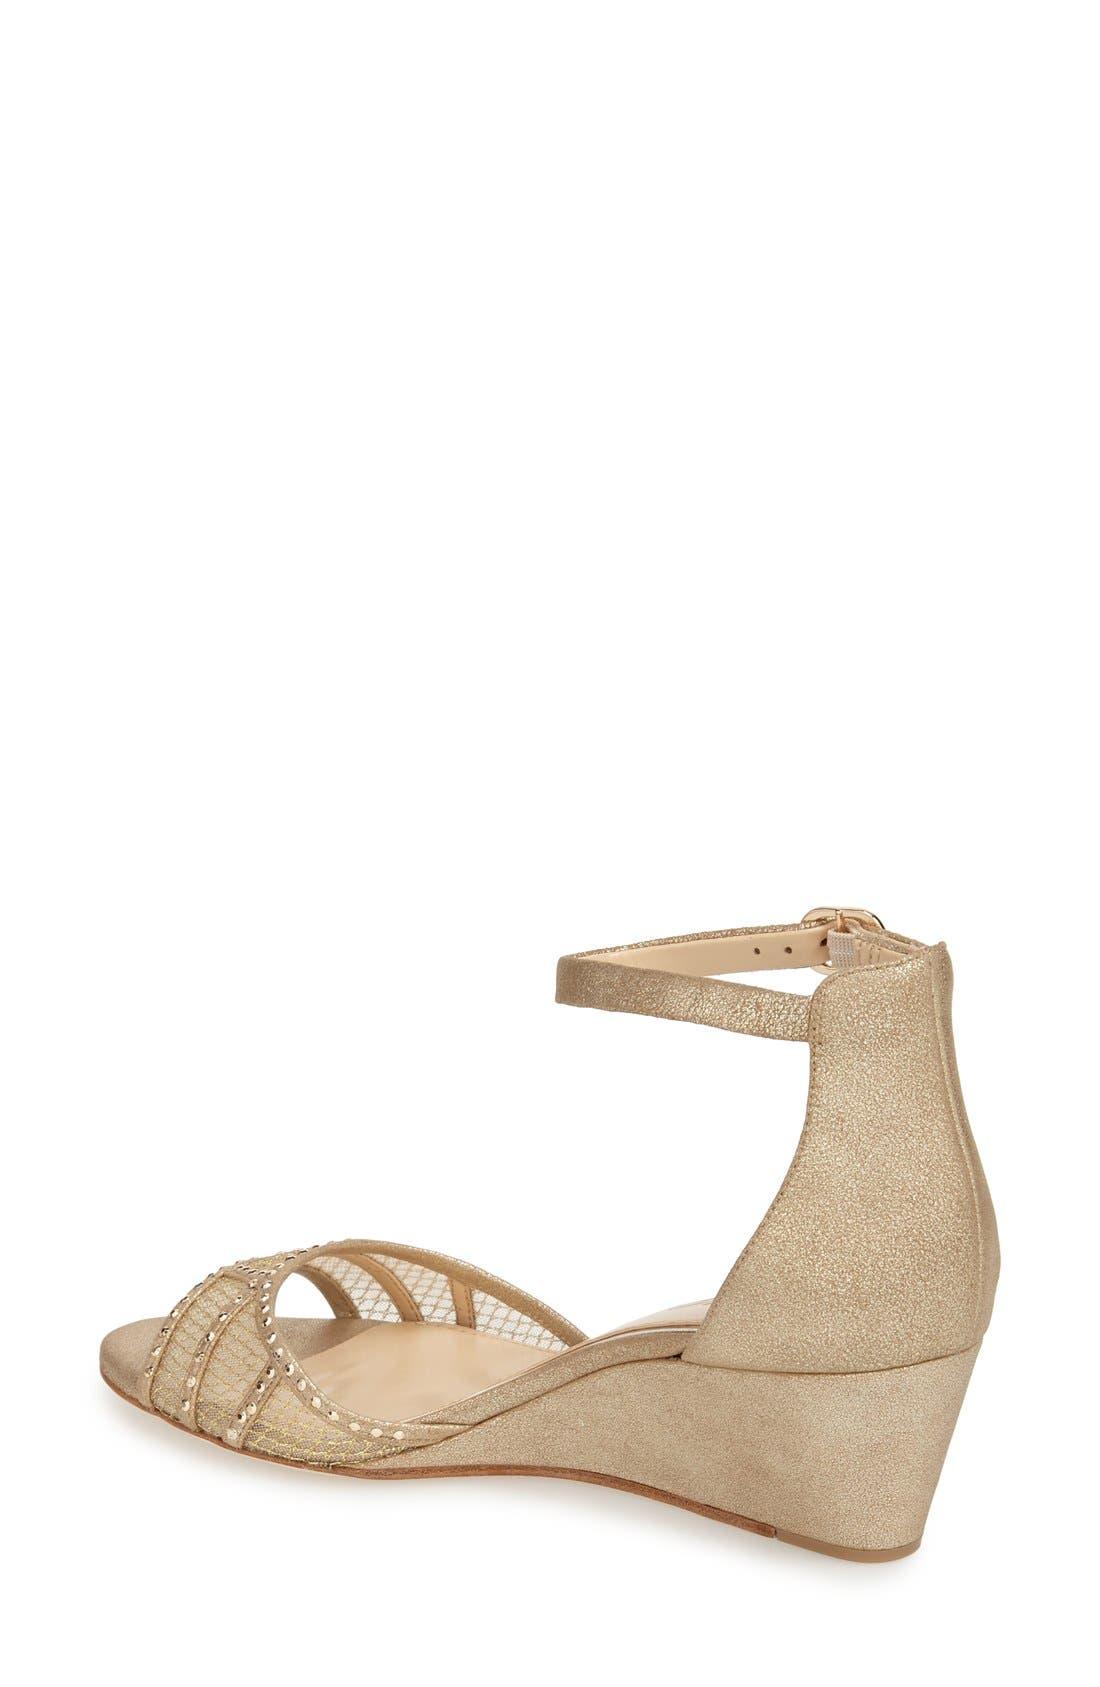 Alternate Image 2  - Imagine by Vince Camuto 'Joan' Studded Wedge Sandal (Women)